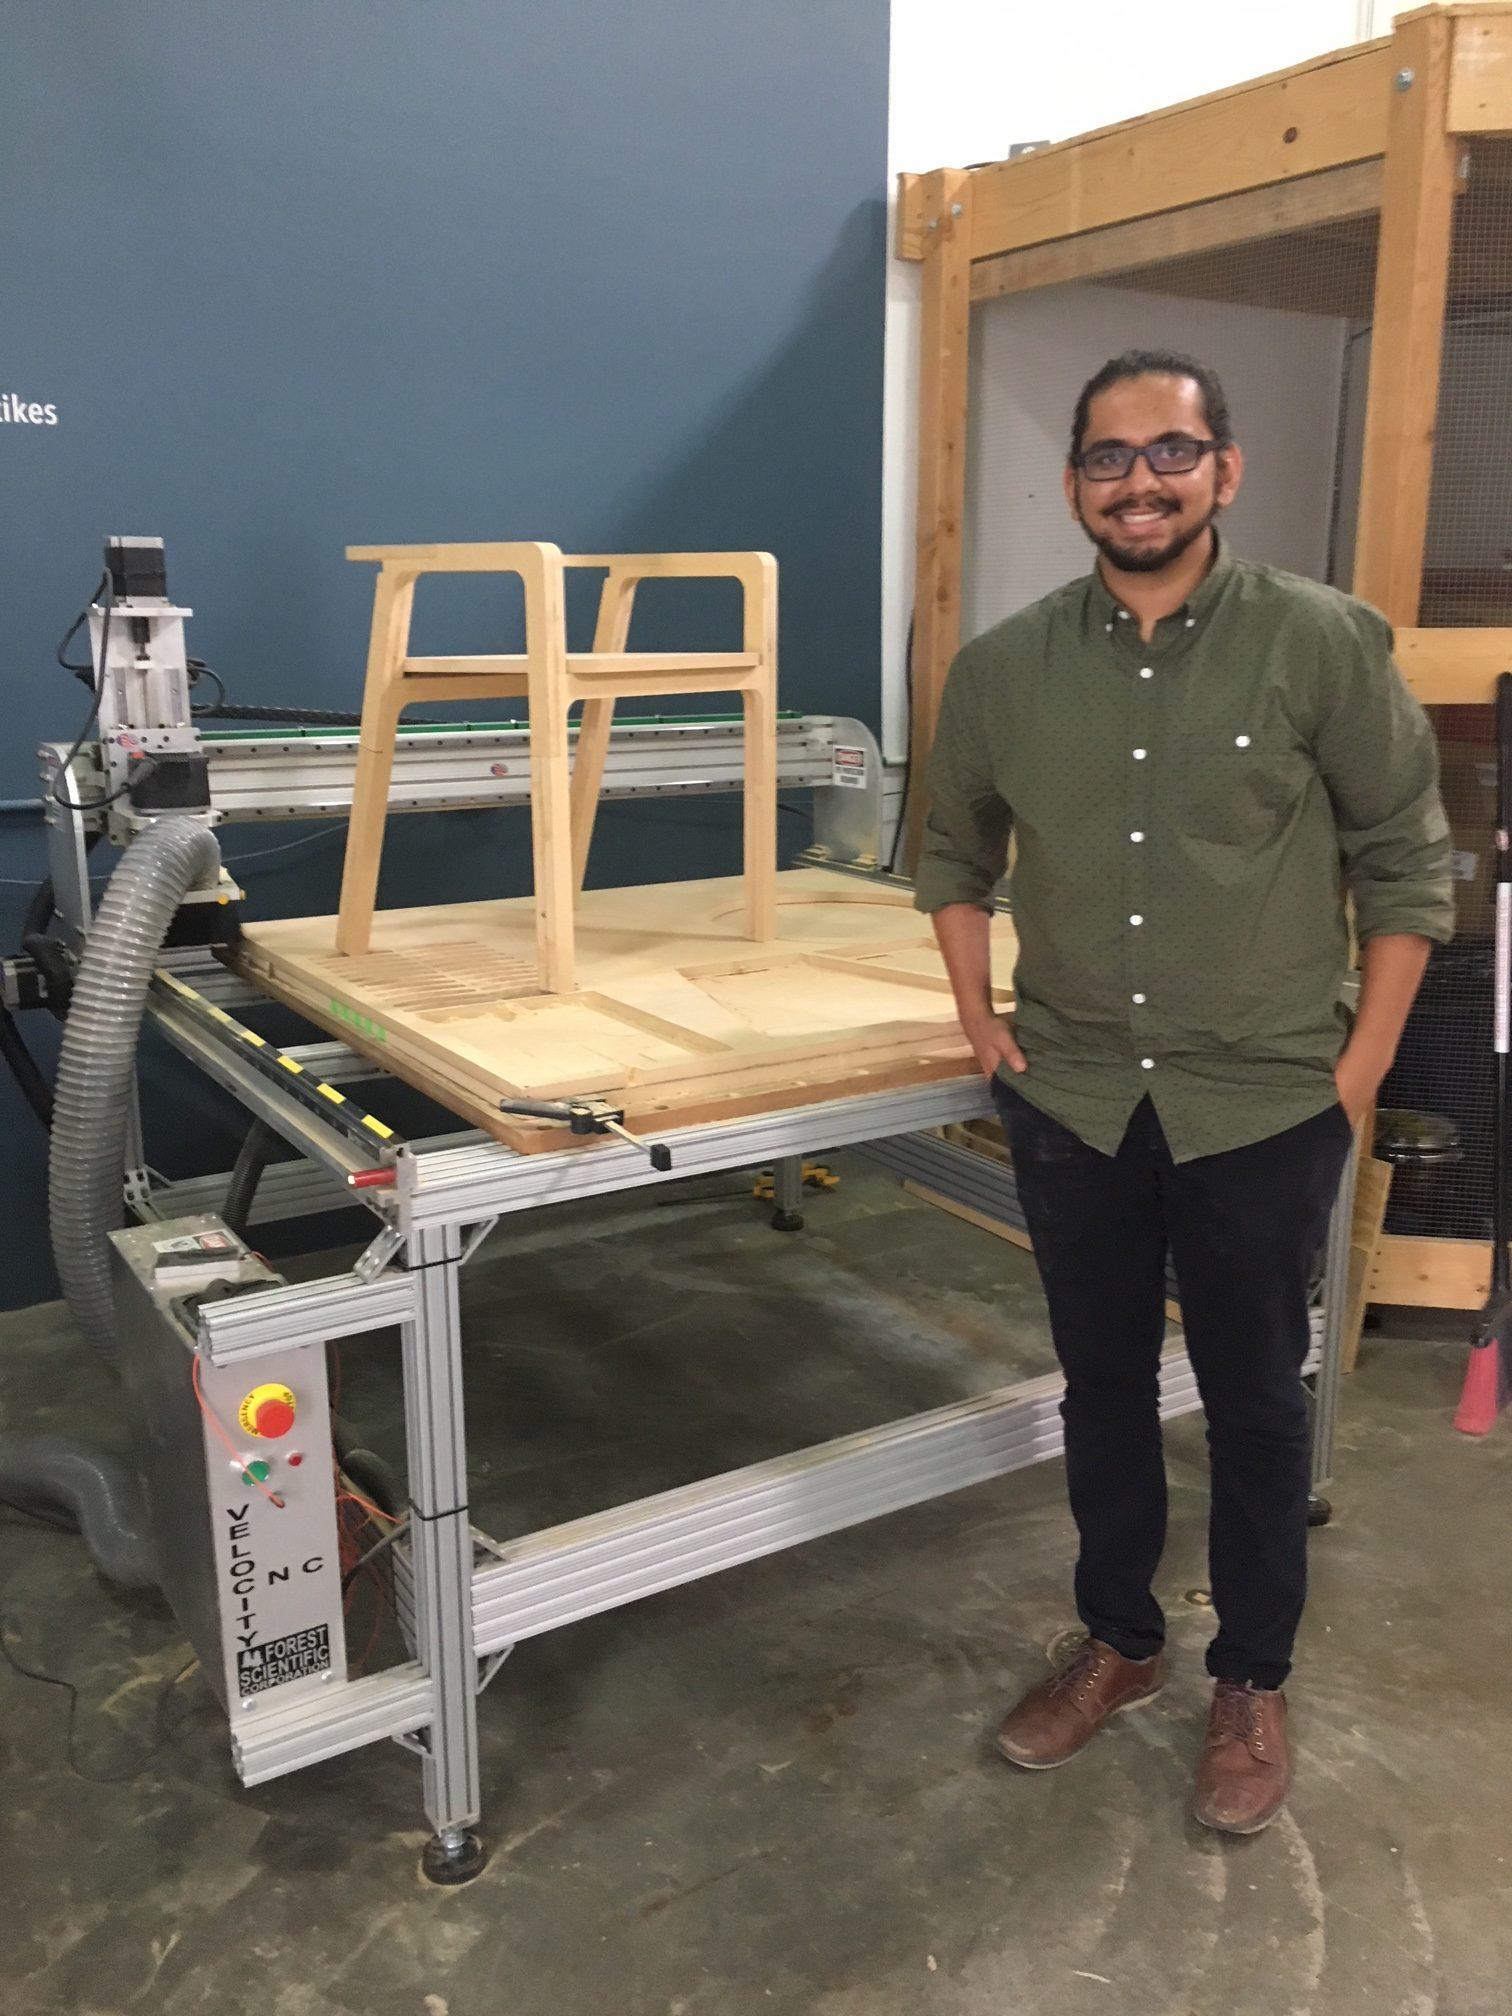 Designing Building Wood Furniture With Cnc Machining Digital Badge